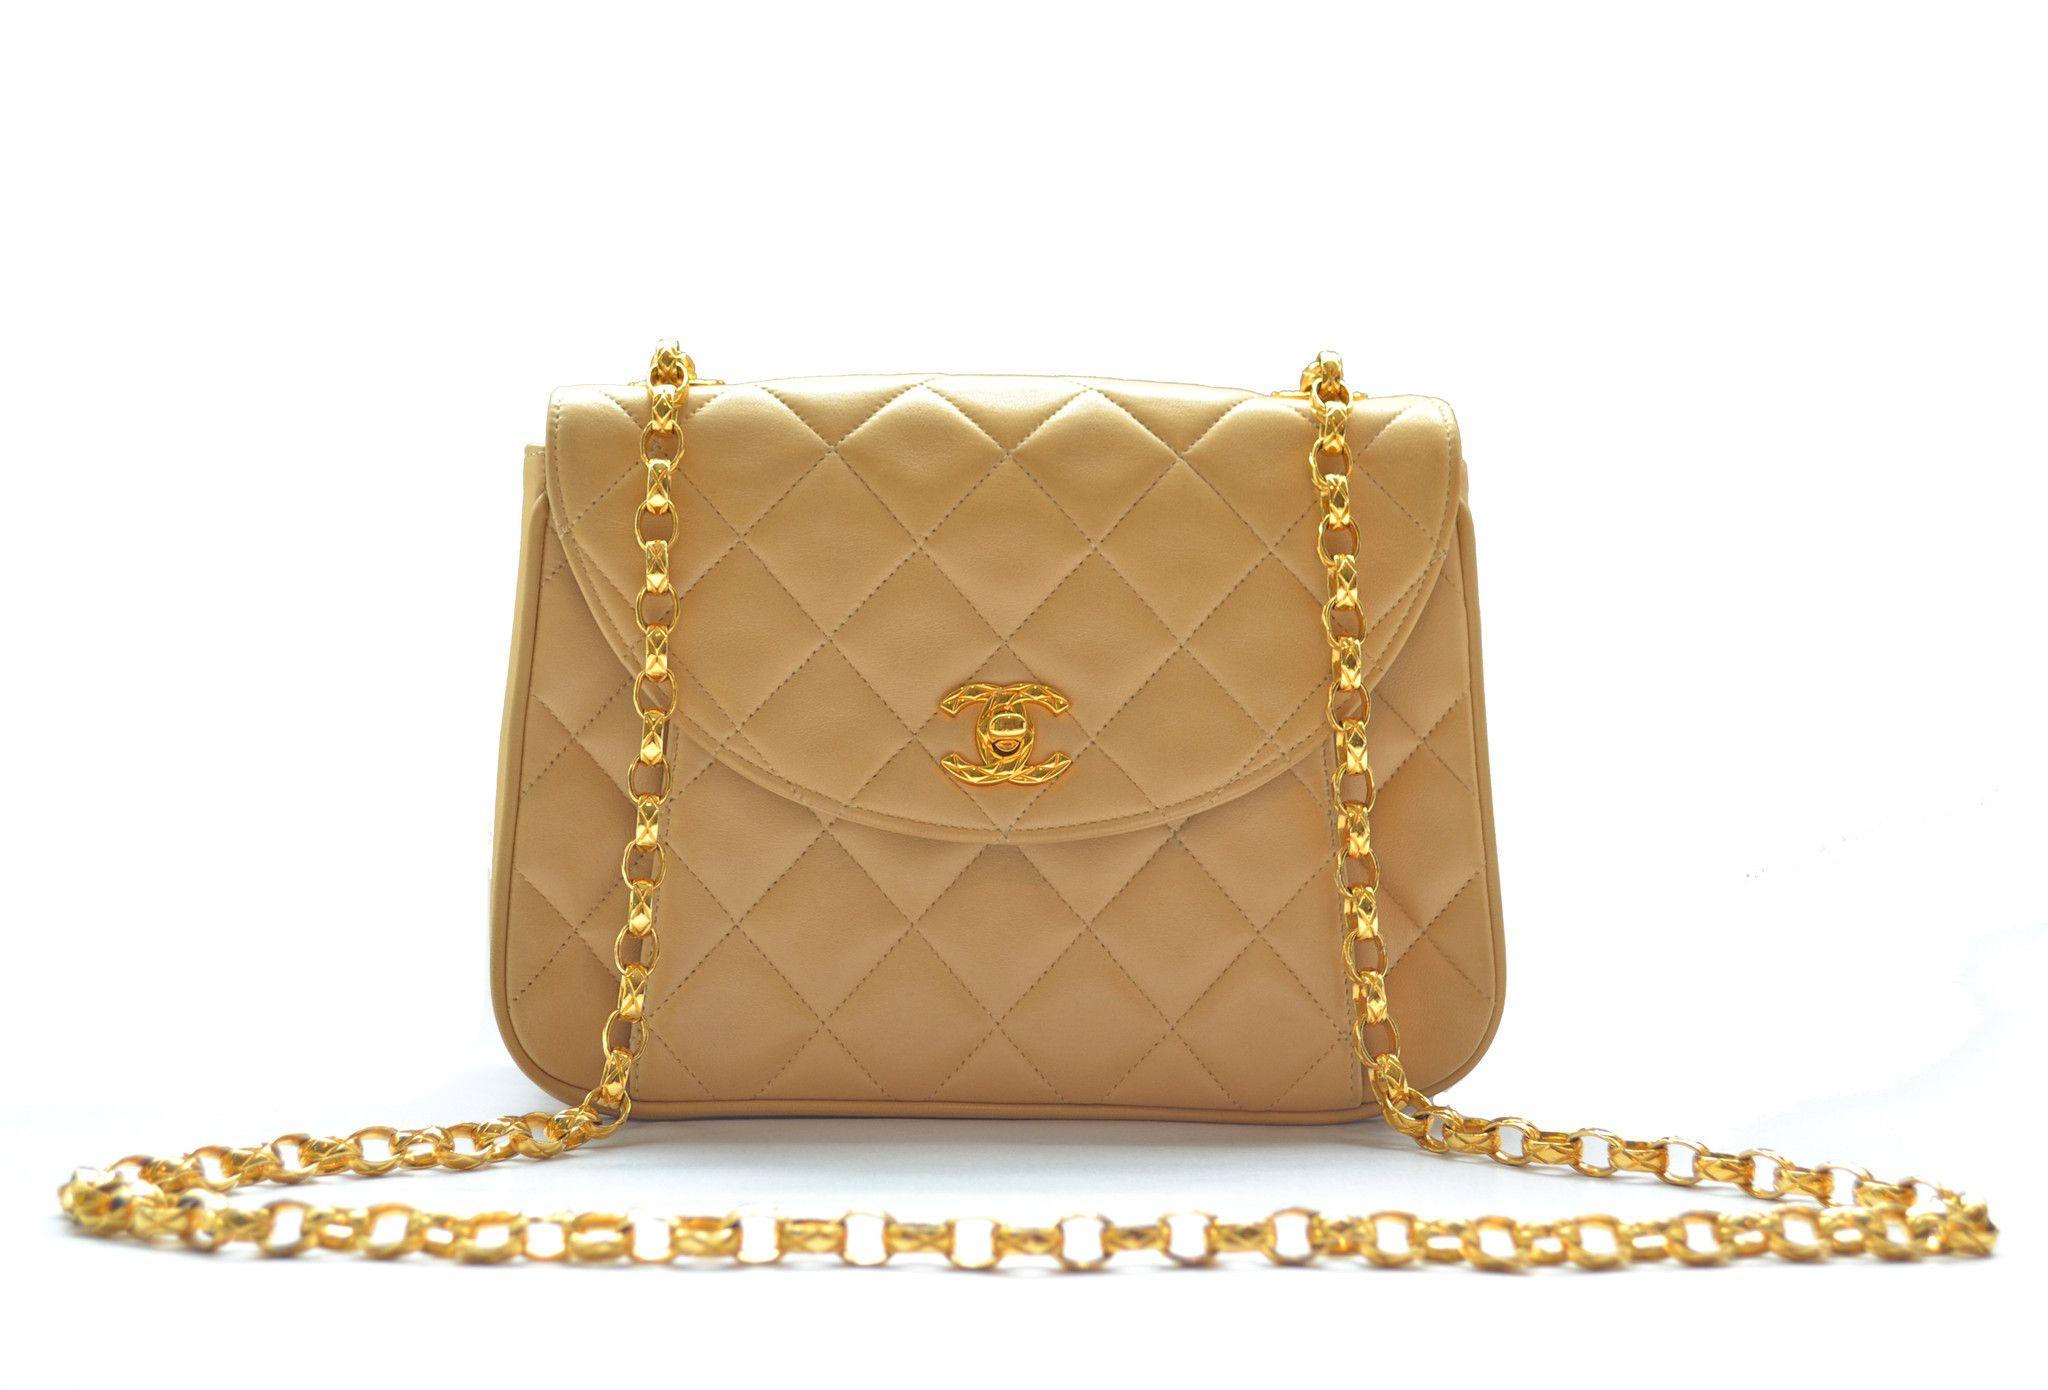 Chanel handbag superb vintage chanel bag vintage leather - Chanel Vintage Bag Beige Quilted Lambskin With Bijoux Chain From Vintage District